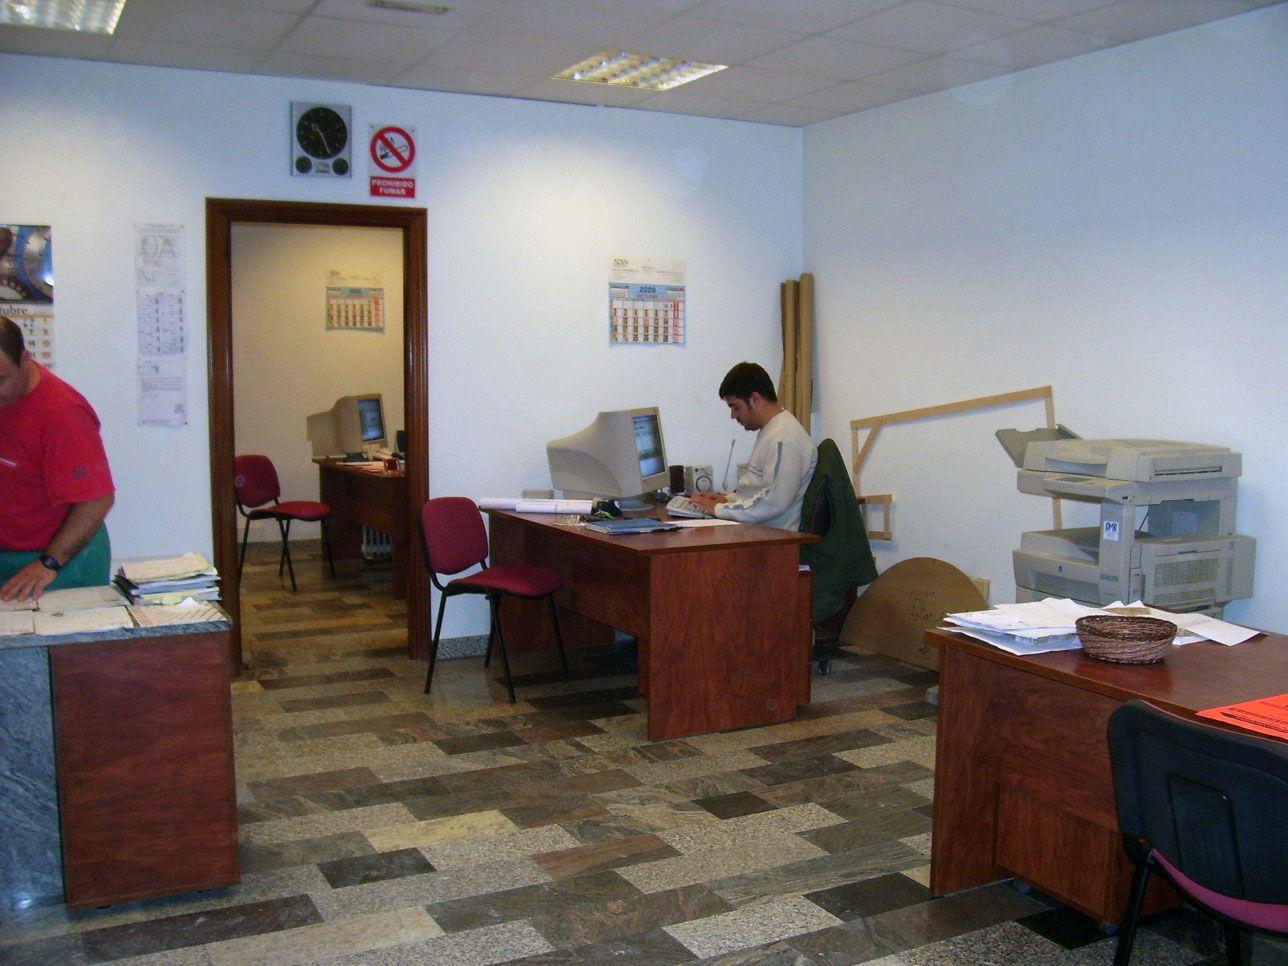 Marmoles roxal s l for Diseno de oficinas administrativas